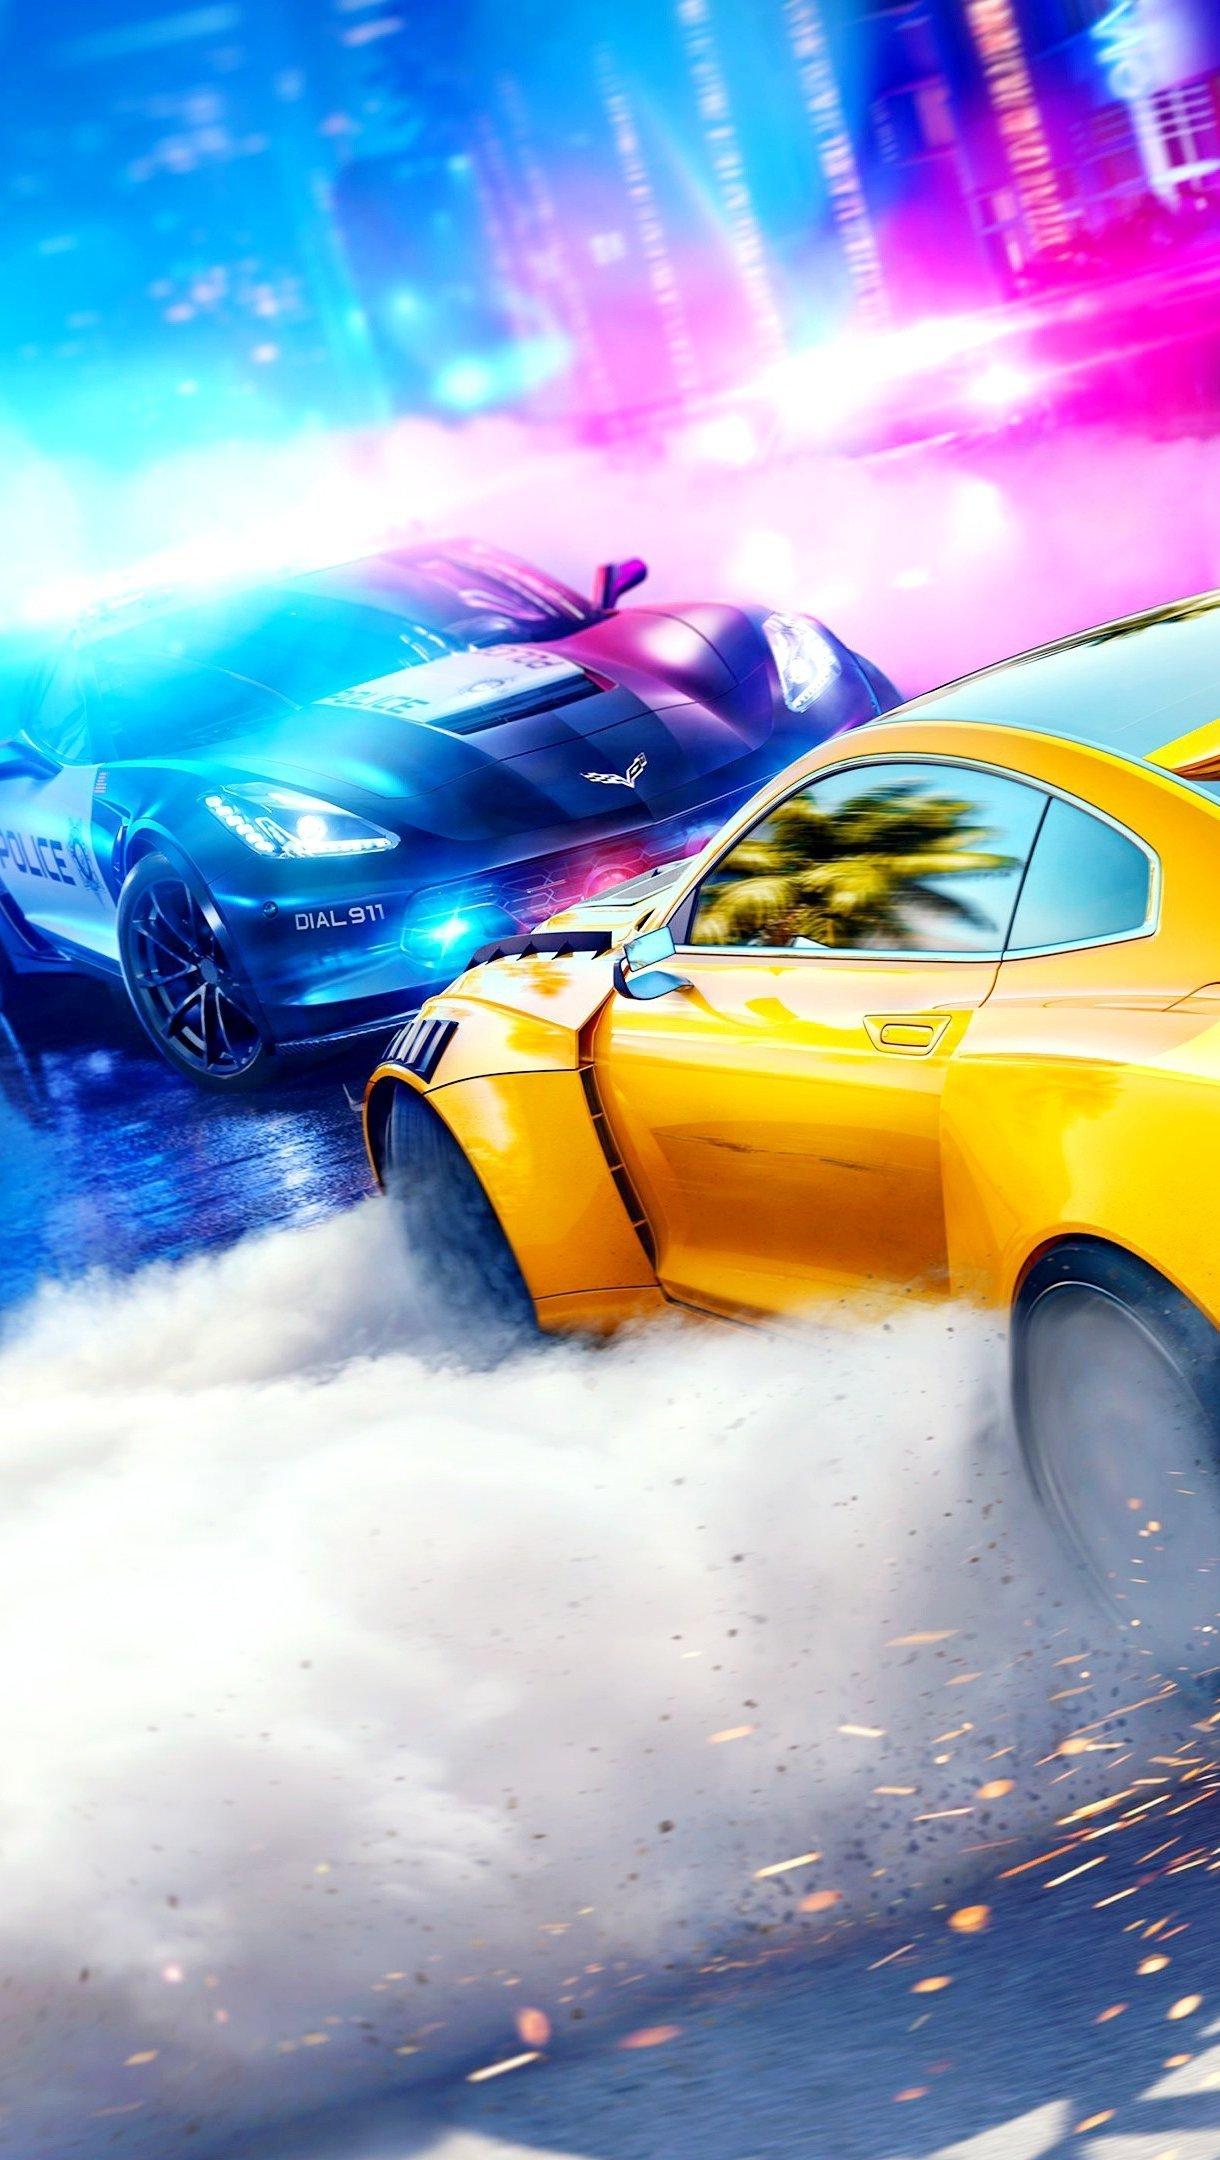 Fondos de pantalla Juego Need for Speed Heat Vertical